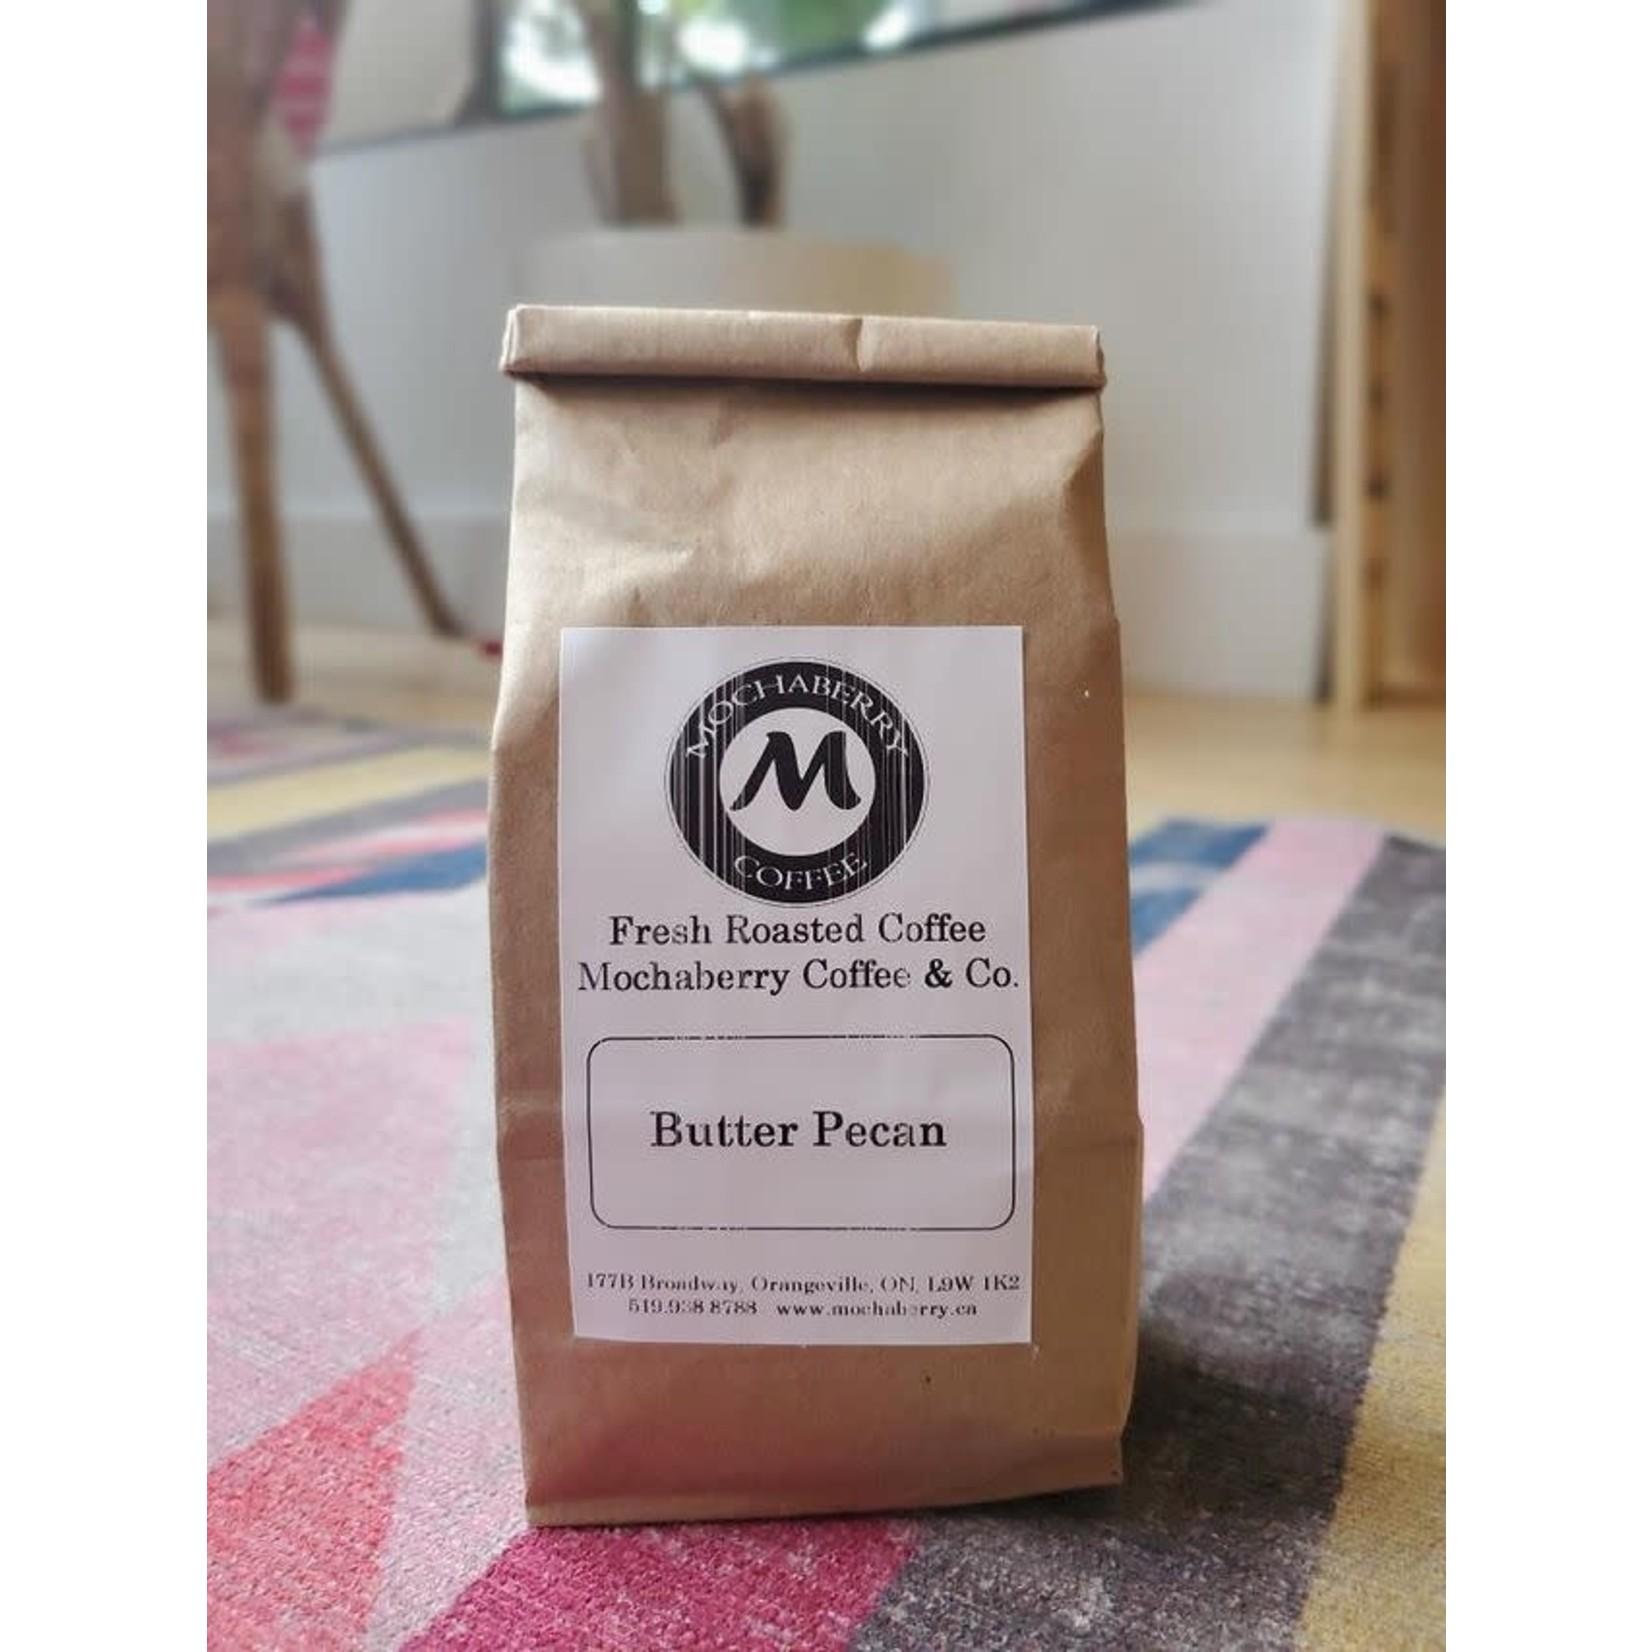 Mochaberry Coffee Co. Butter Pecan Whole Bean Coffee (8oz)